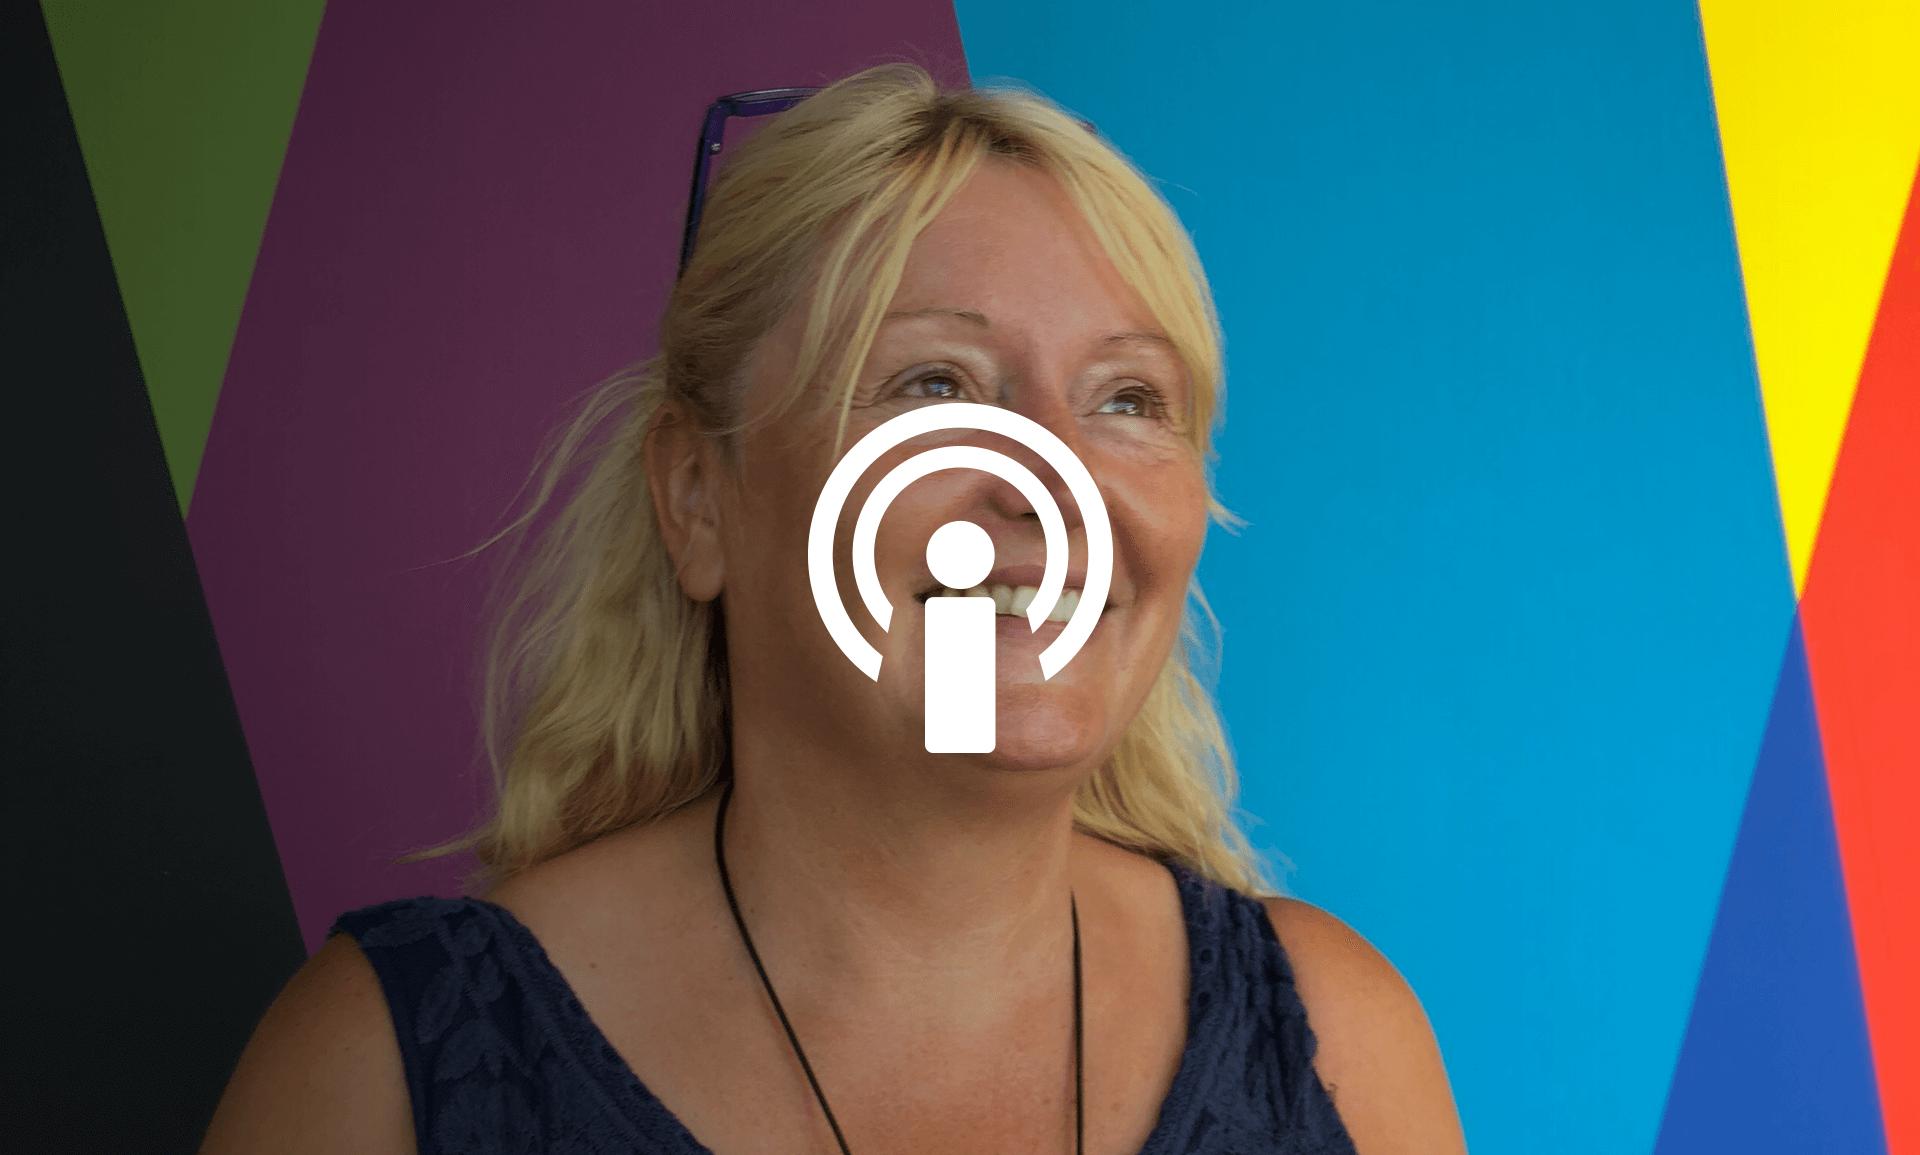 Laura podcast thumbnail